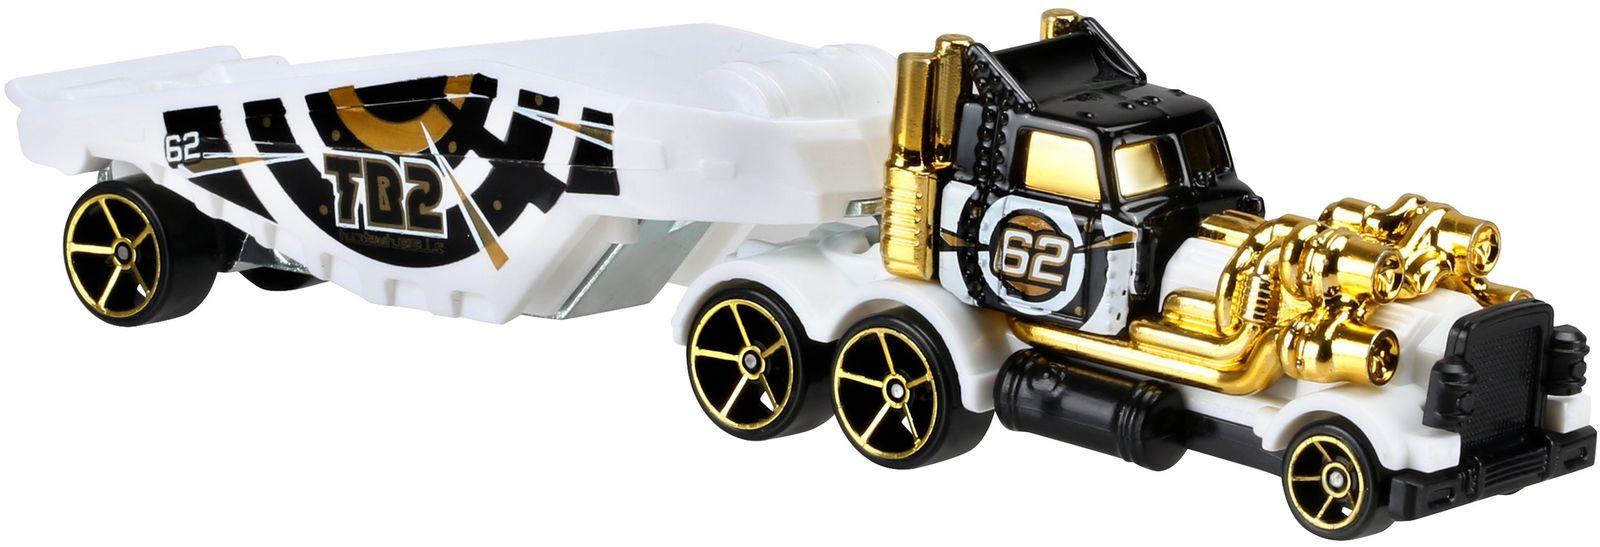 Hot Wheels Трейлер Turbo Beast цвет белый черный золотистый hot wheels track stars трейлер aero blast